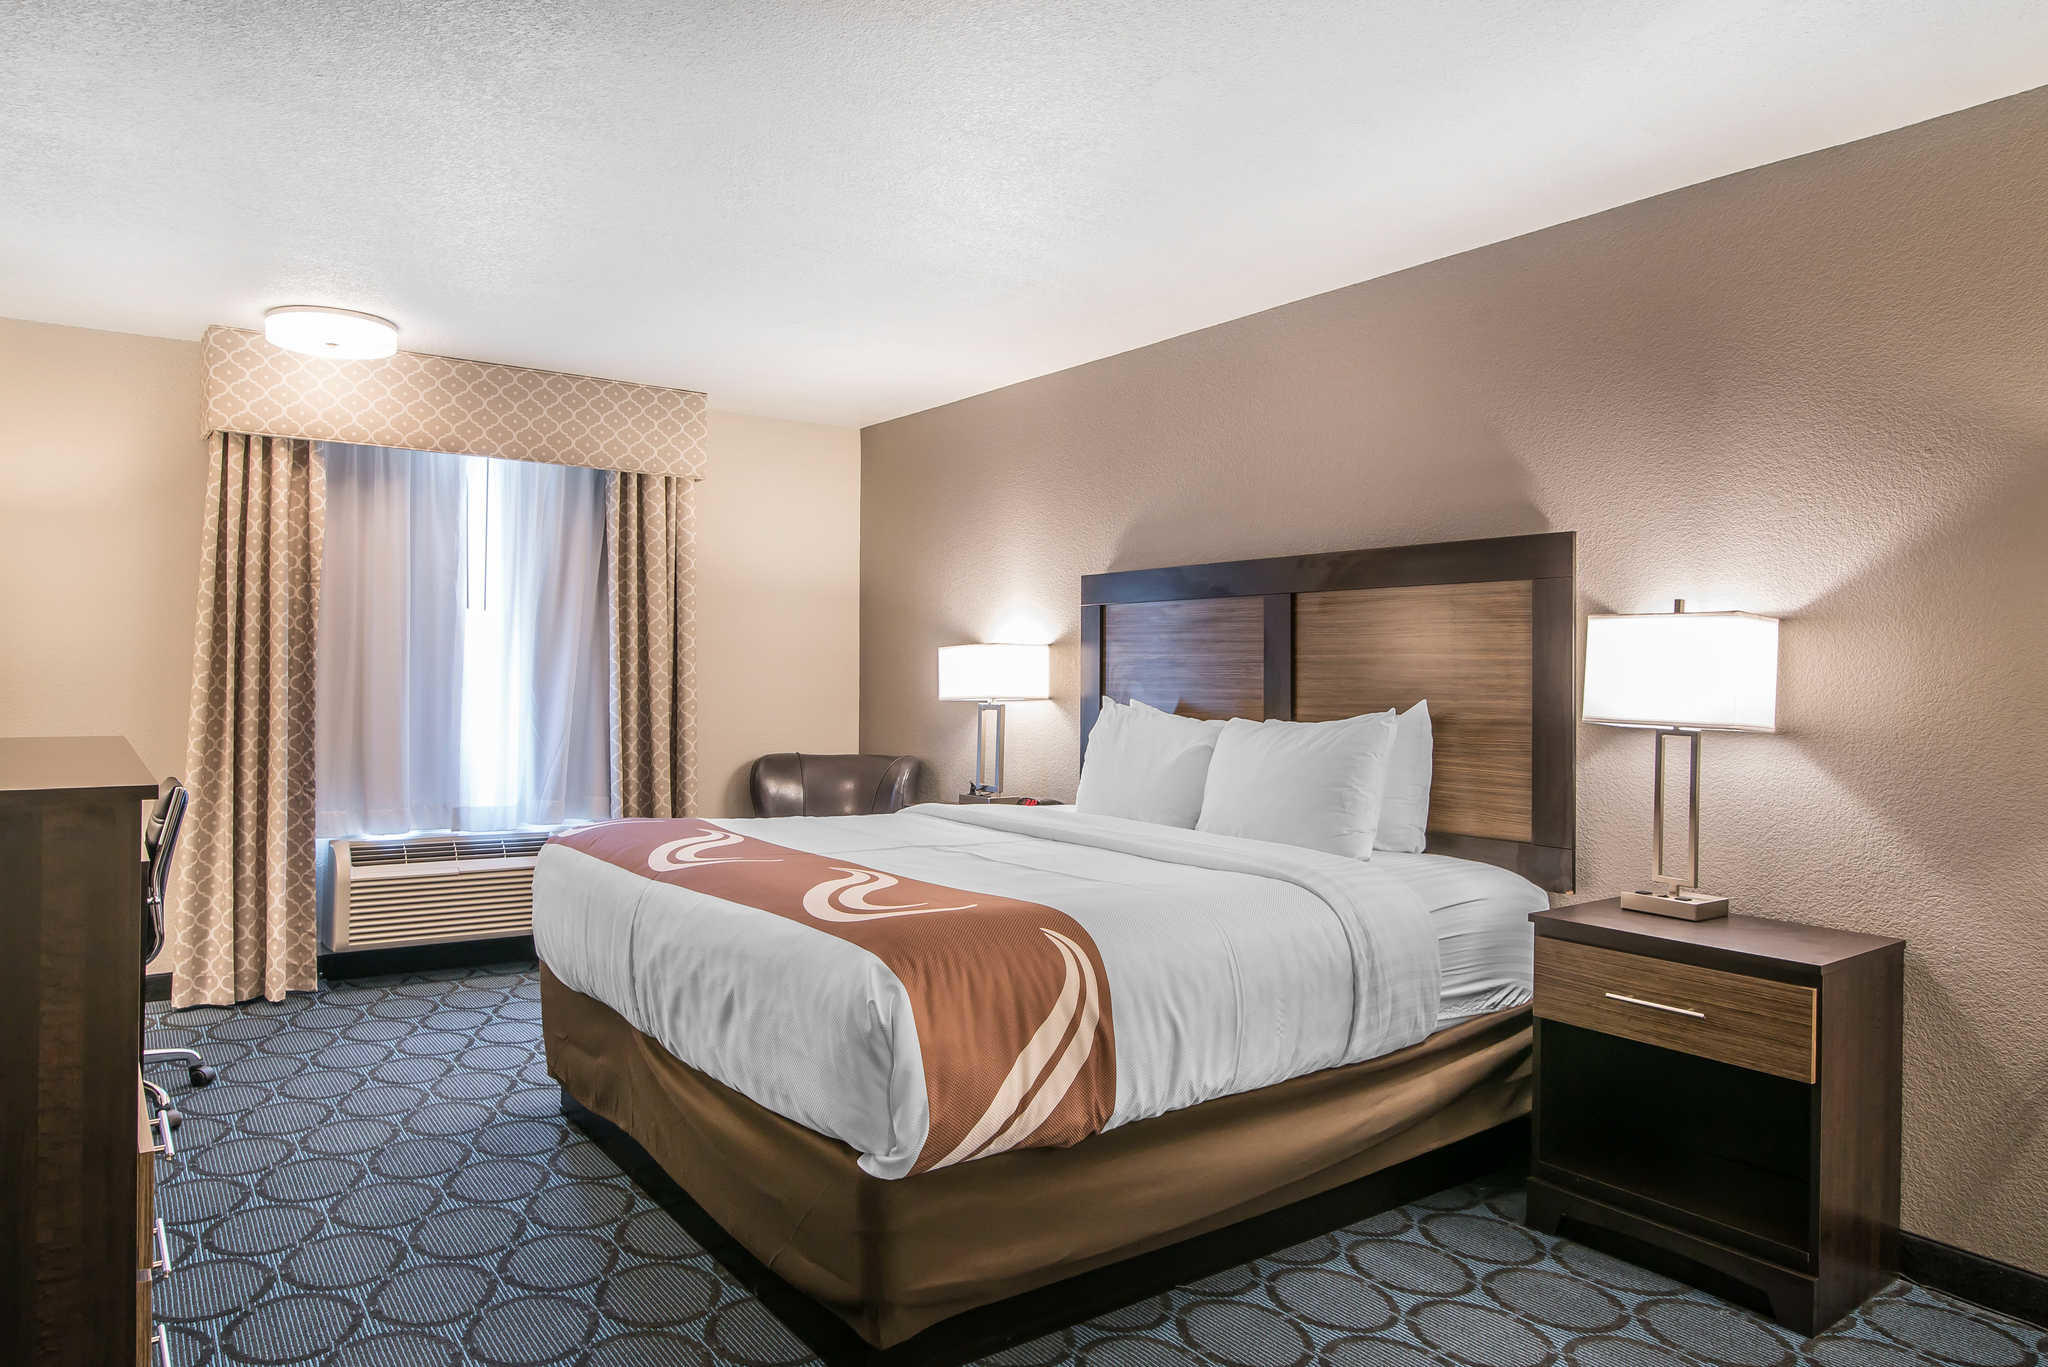 Quality Inn & Suites - Ruidoso Hwy 70 image 8